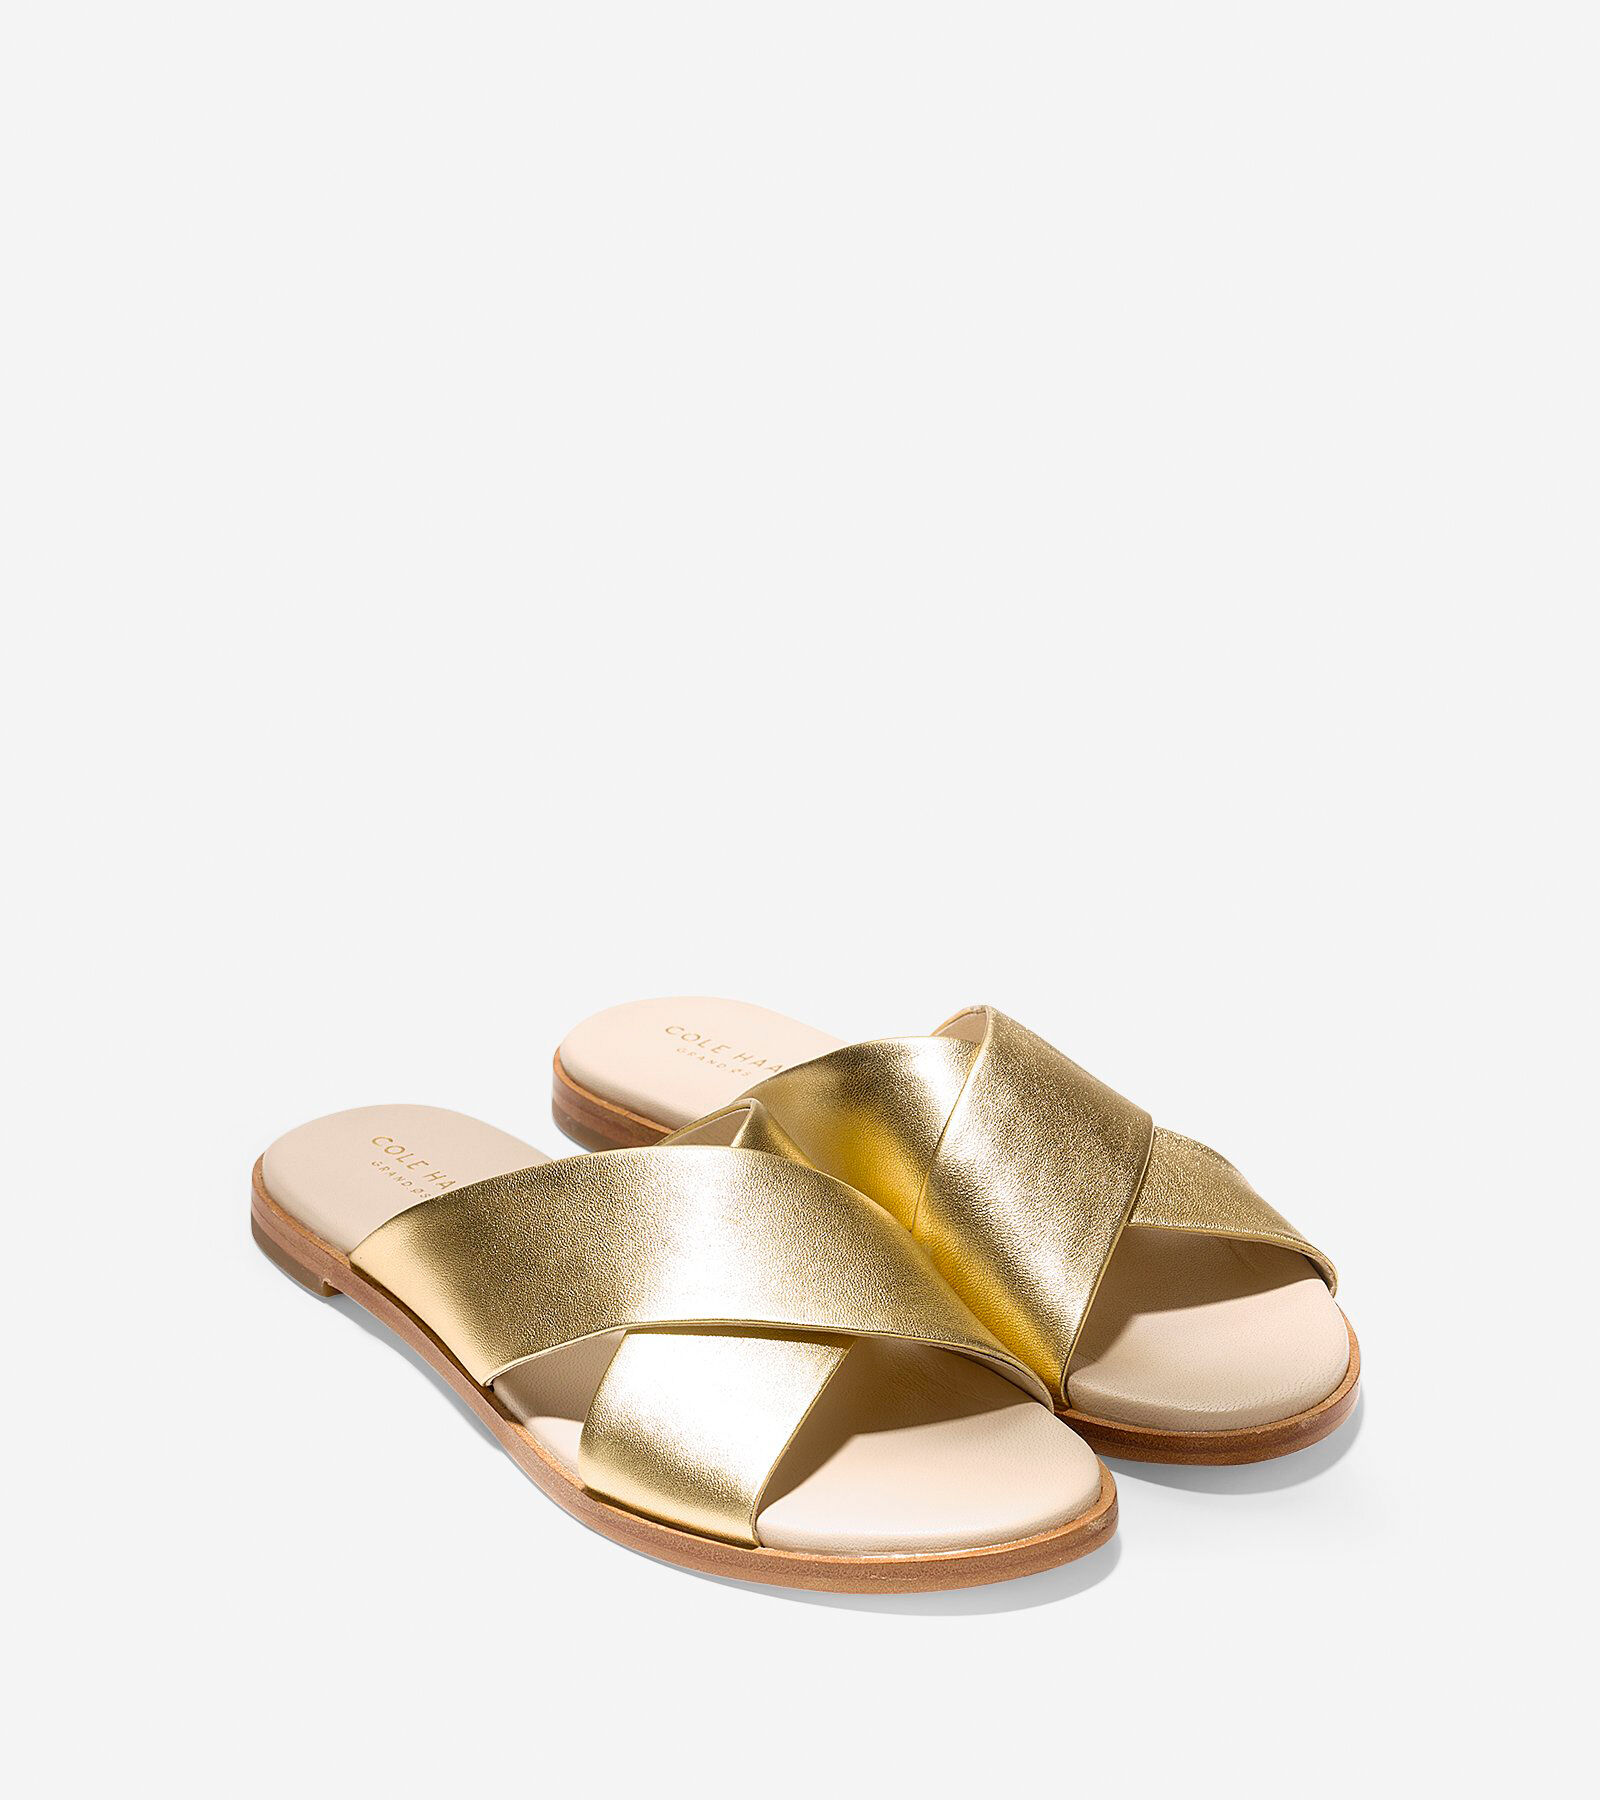 Anica Criss Cross Sandals tCIE2A